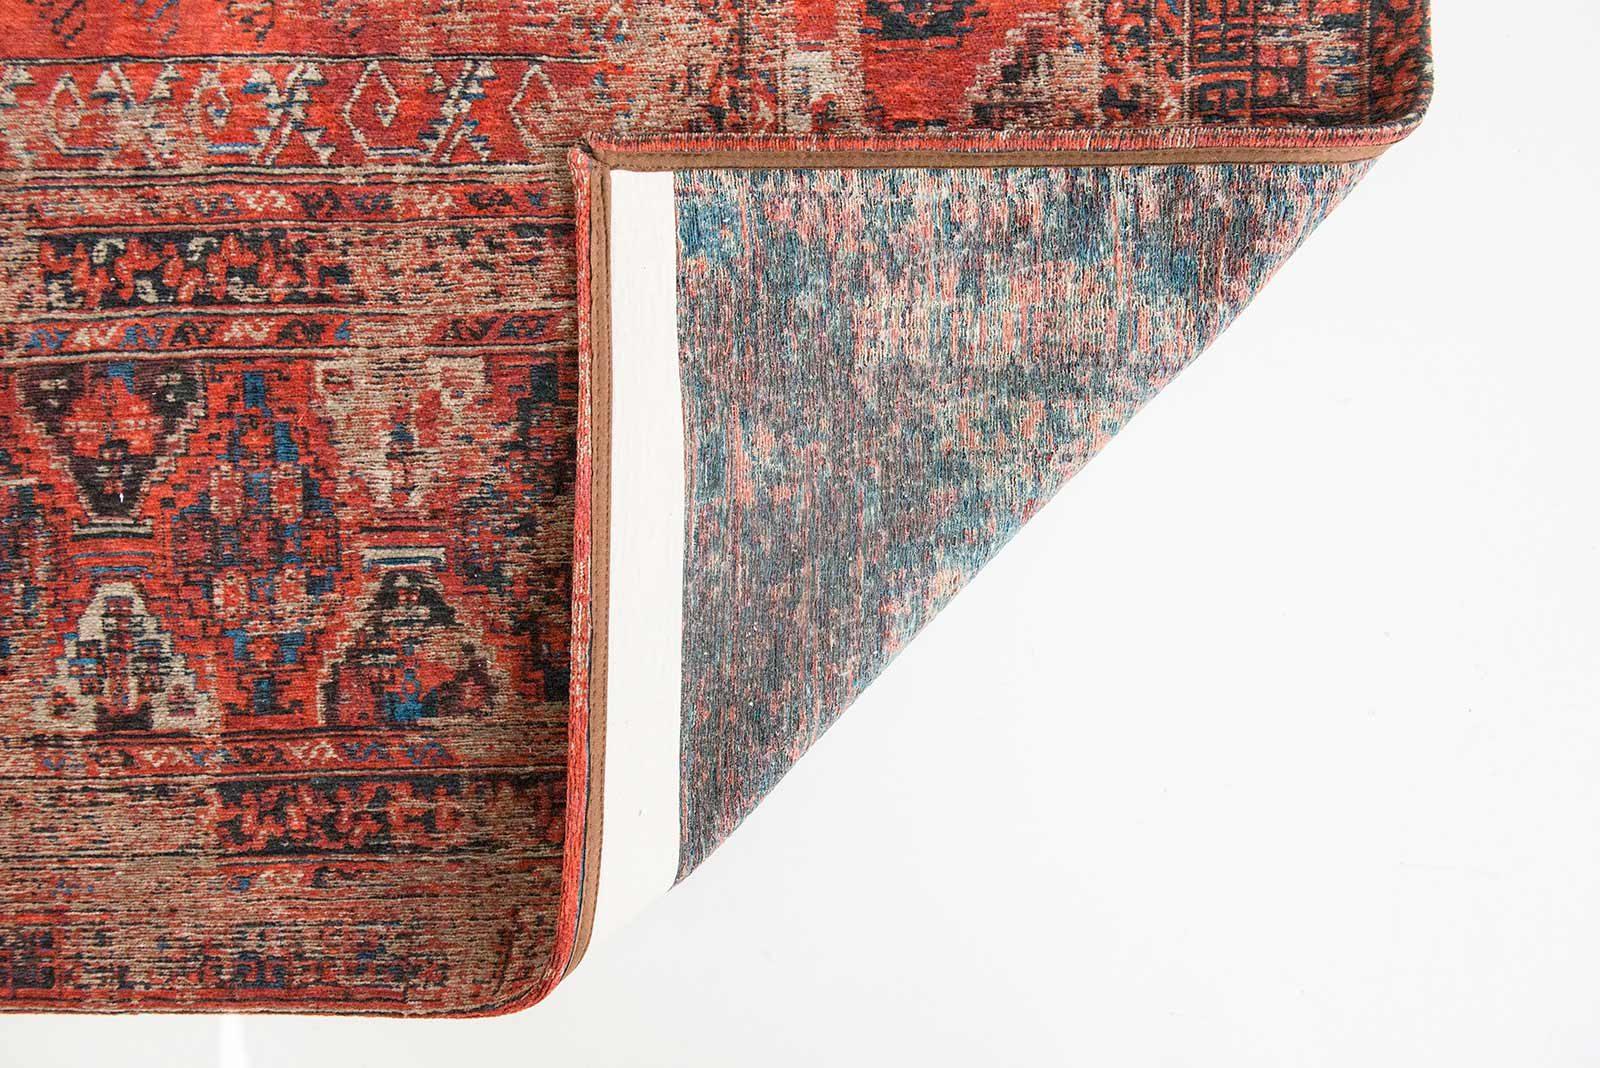 rugs Louis De Poortere LX8719 Antiquarian Antique Hadschlu 782 Red back